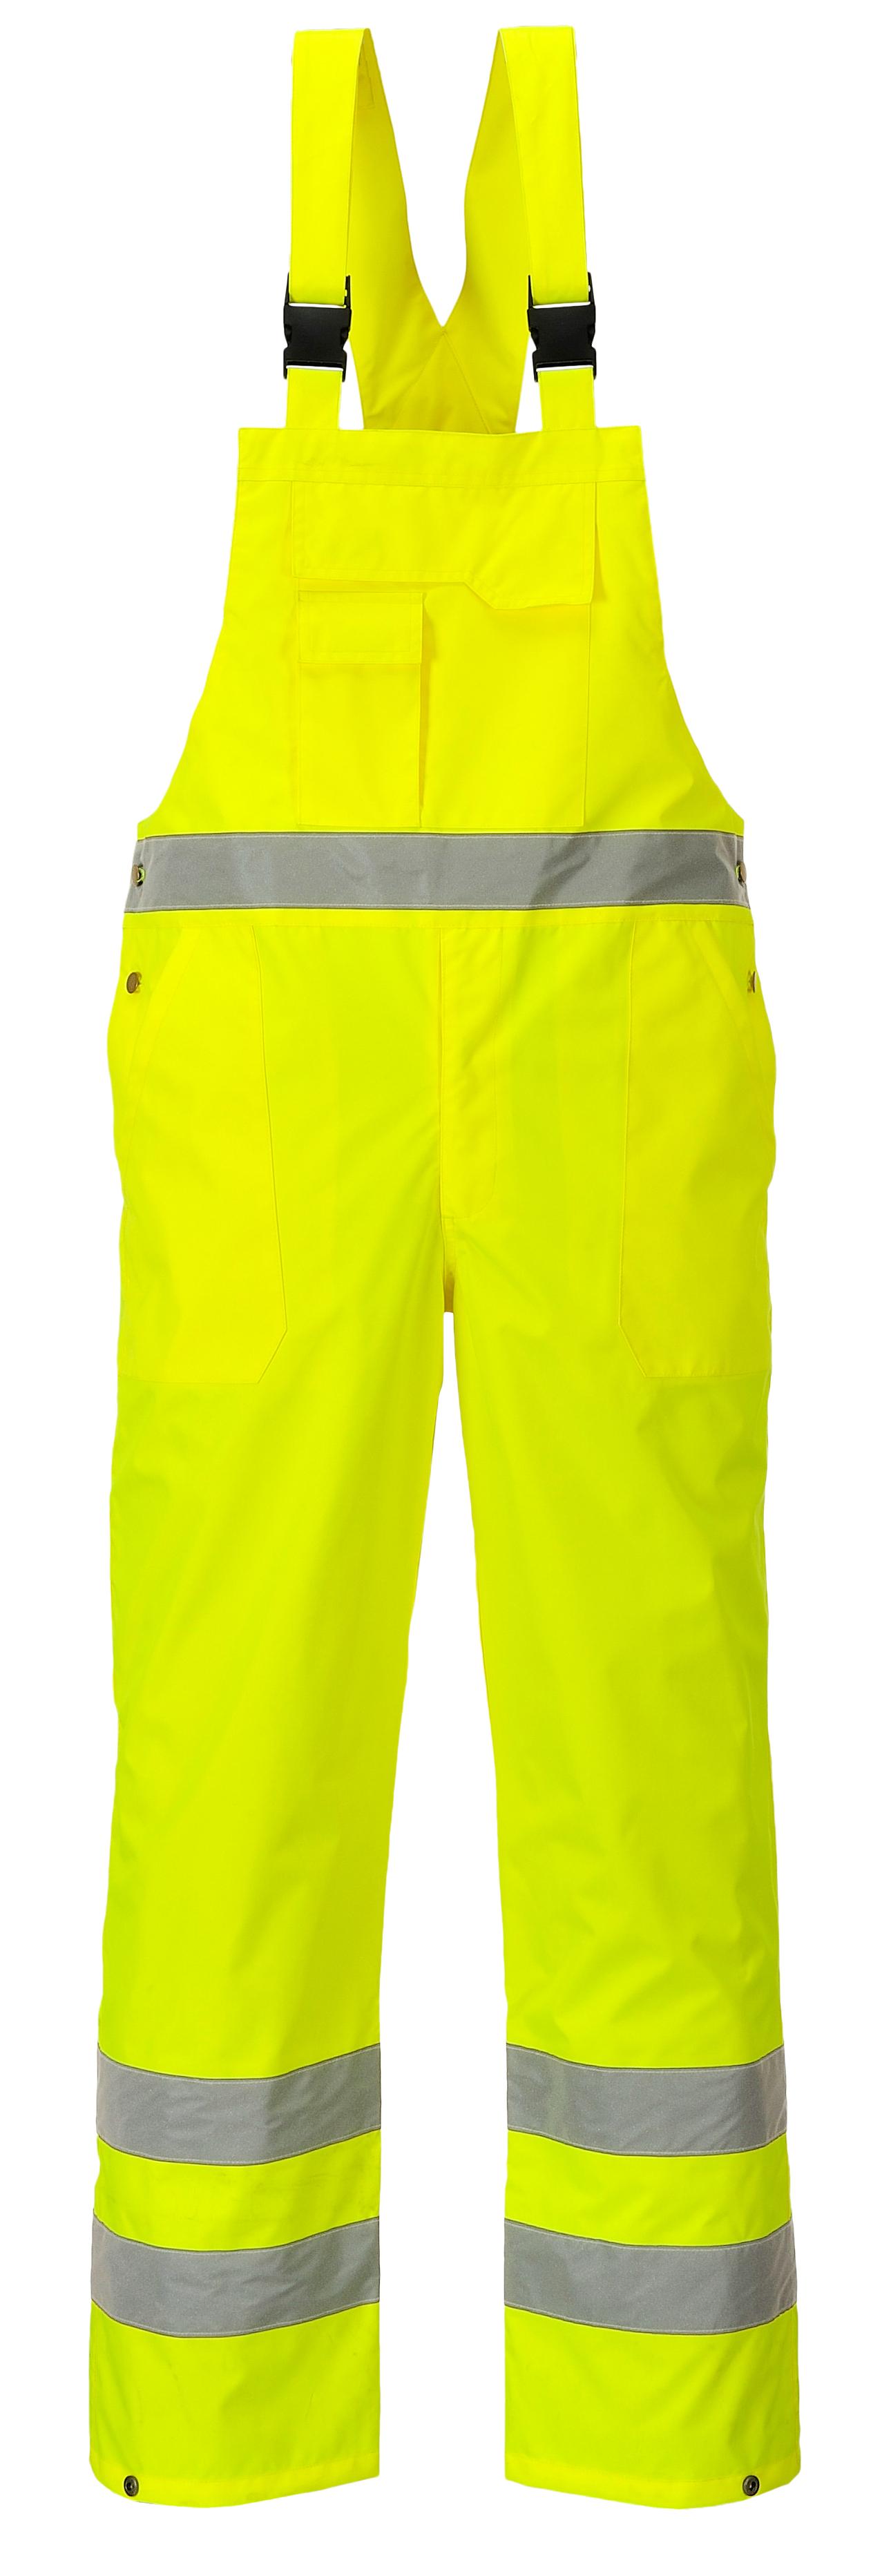 d6dc611f224a Pracovné odevy - Reflexné nohavice na traky - nepodšité empty